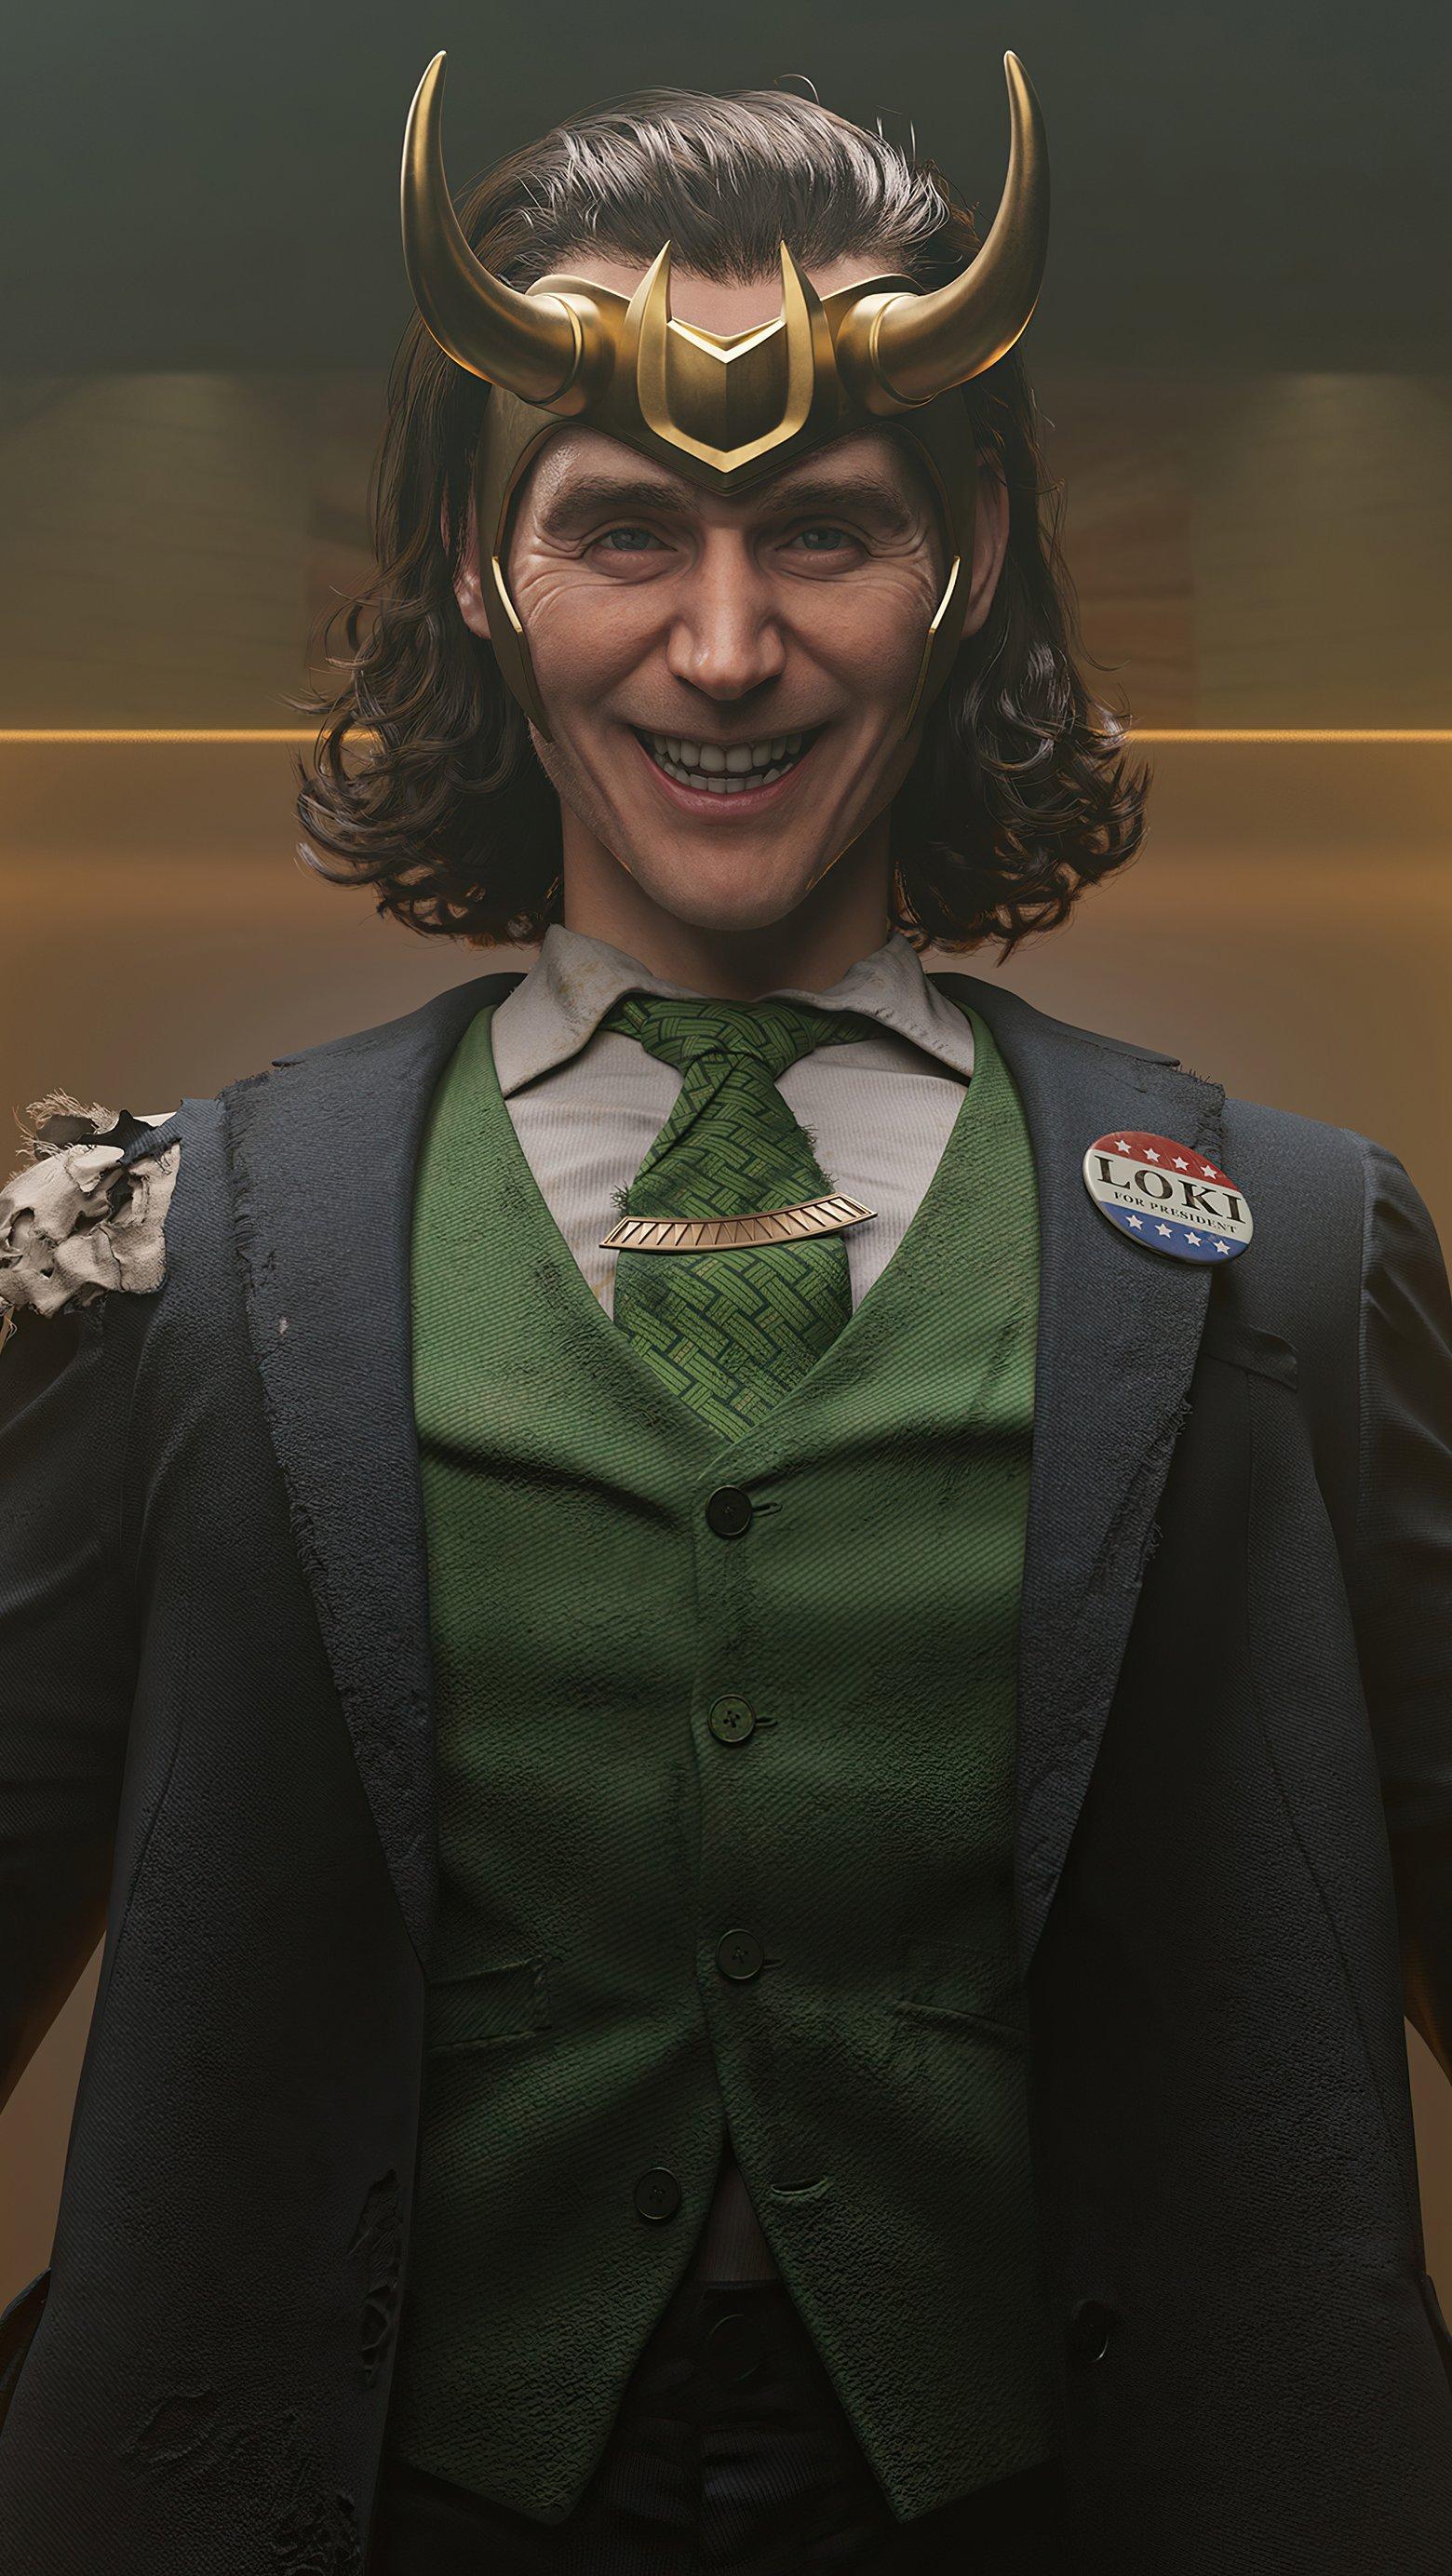 Wallpaper Loki smiling Vertical